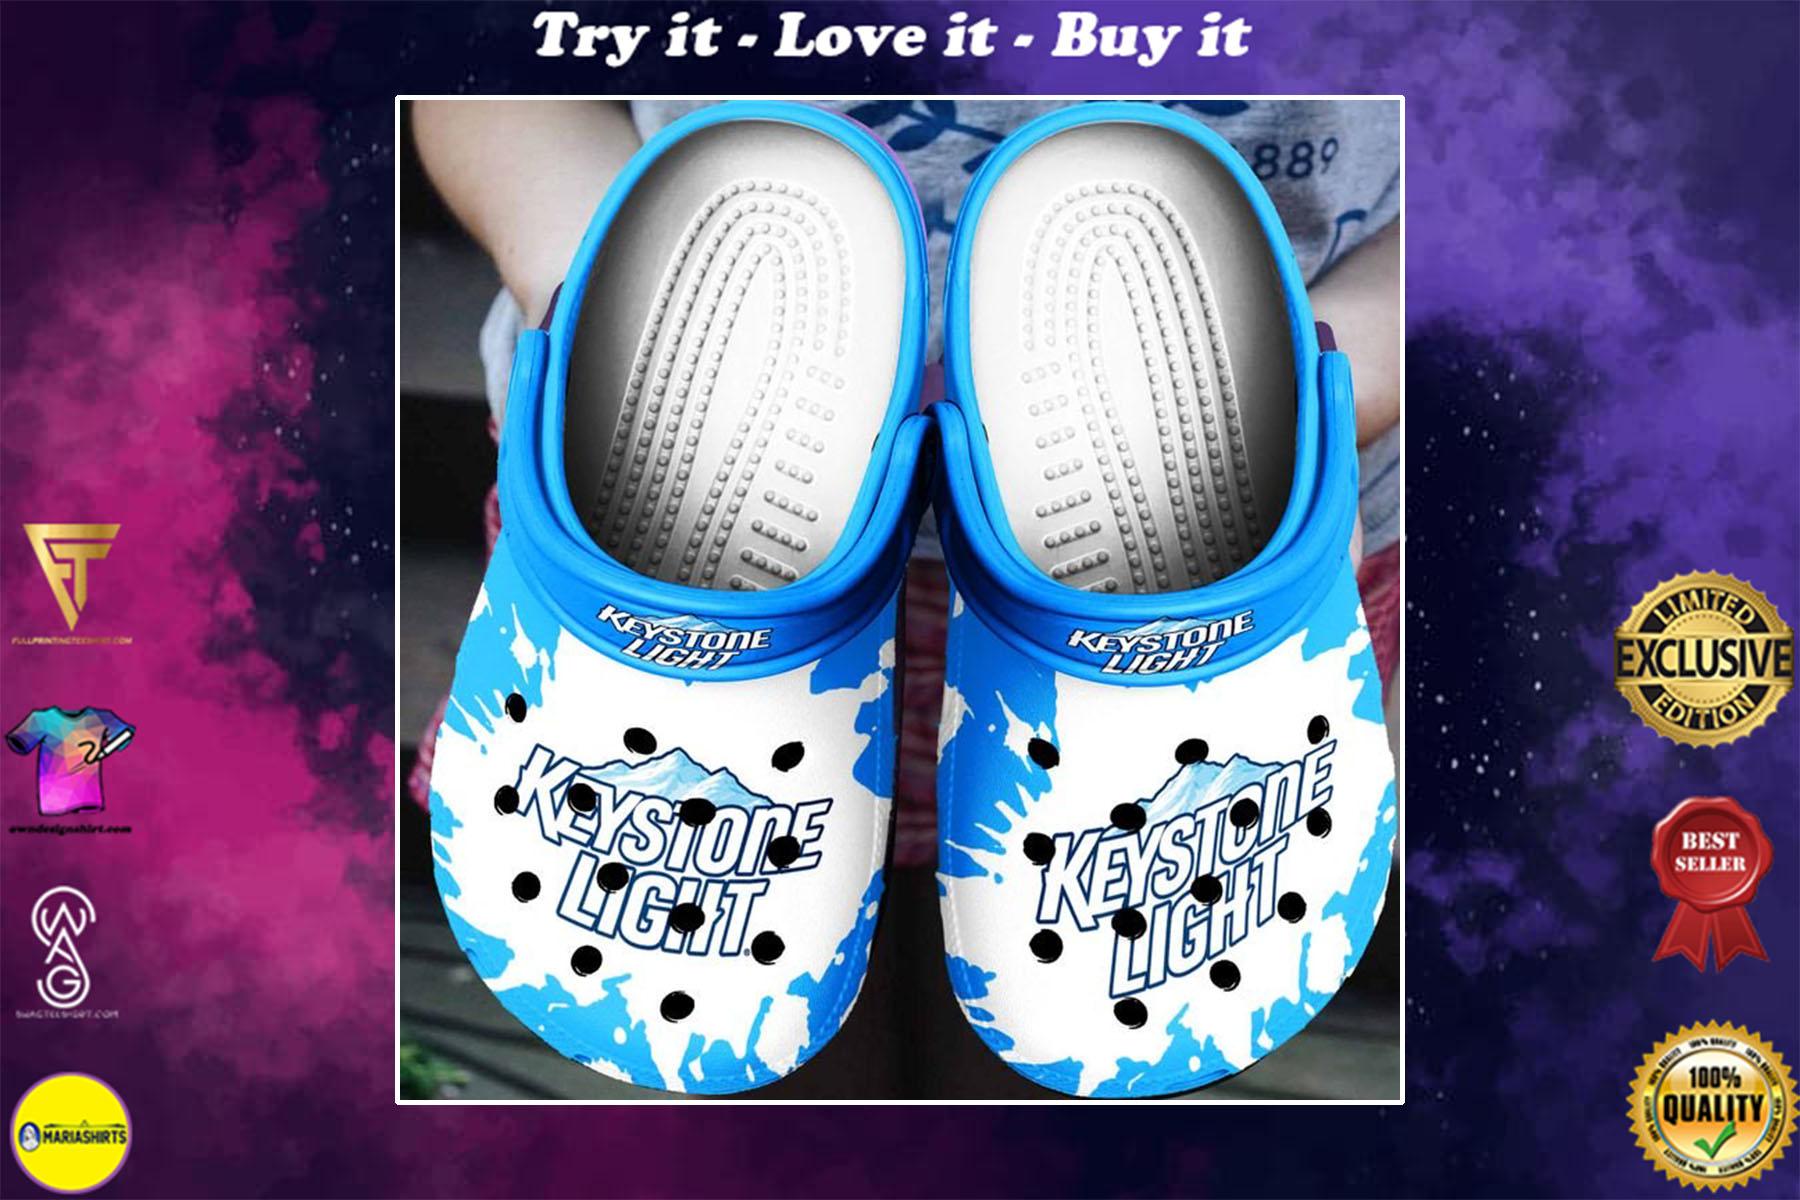 [special edition] keystone light beer crocs shoes - maria